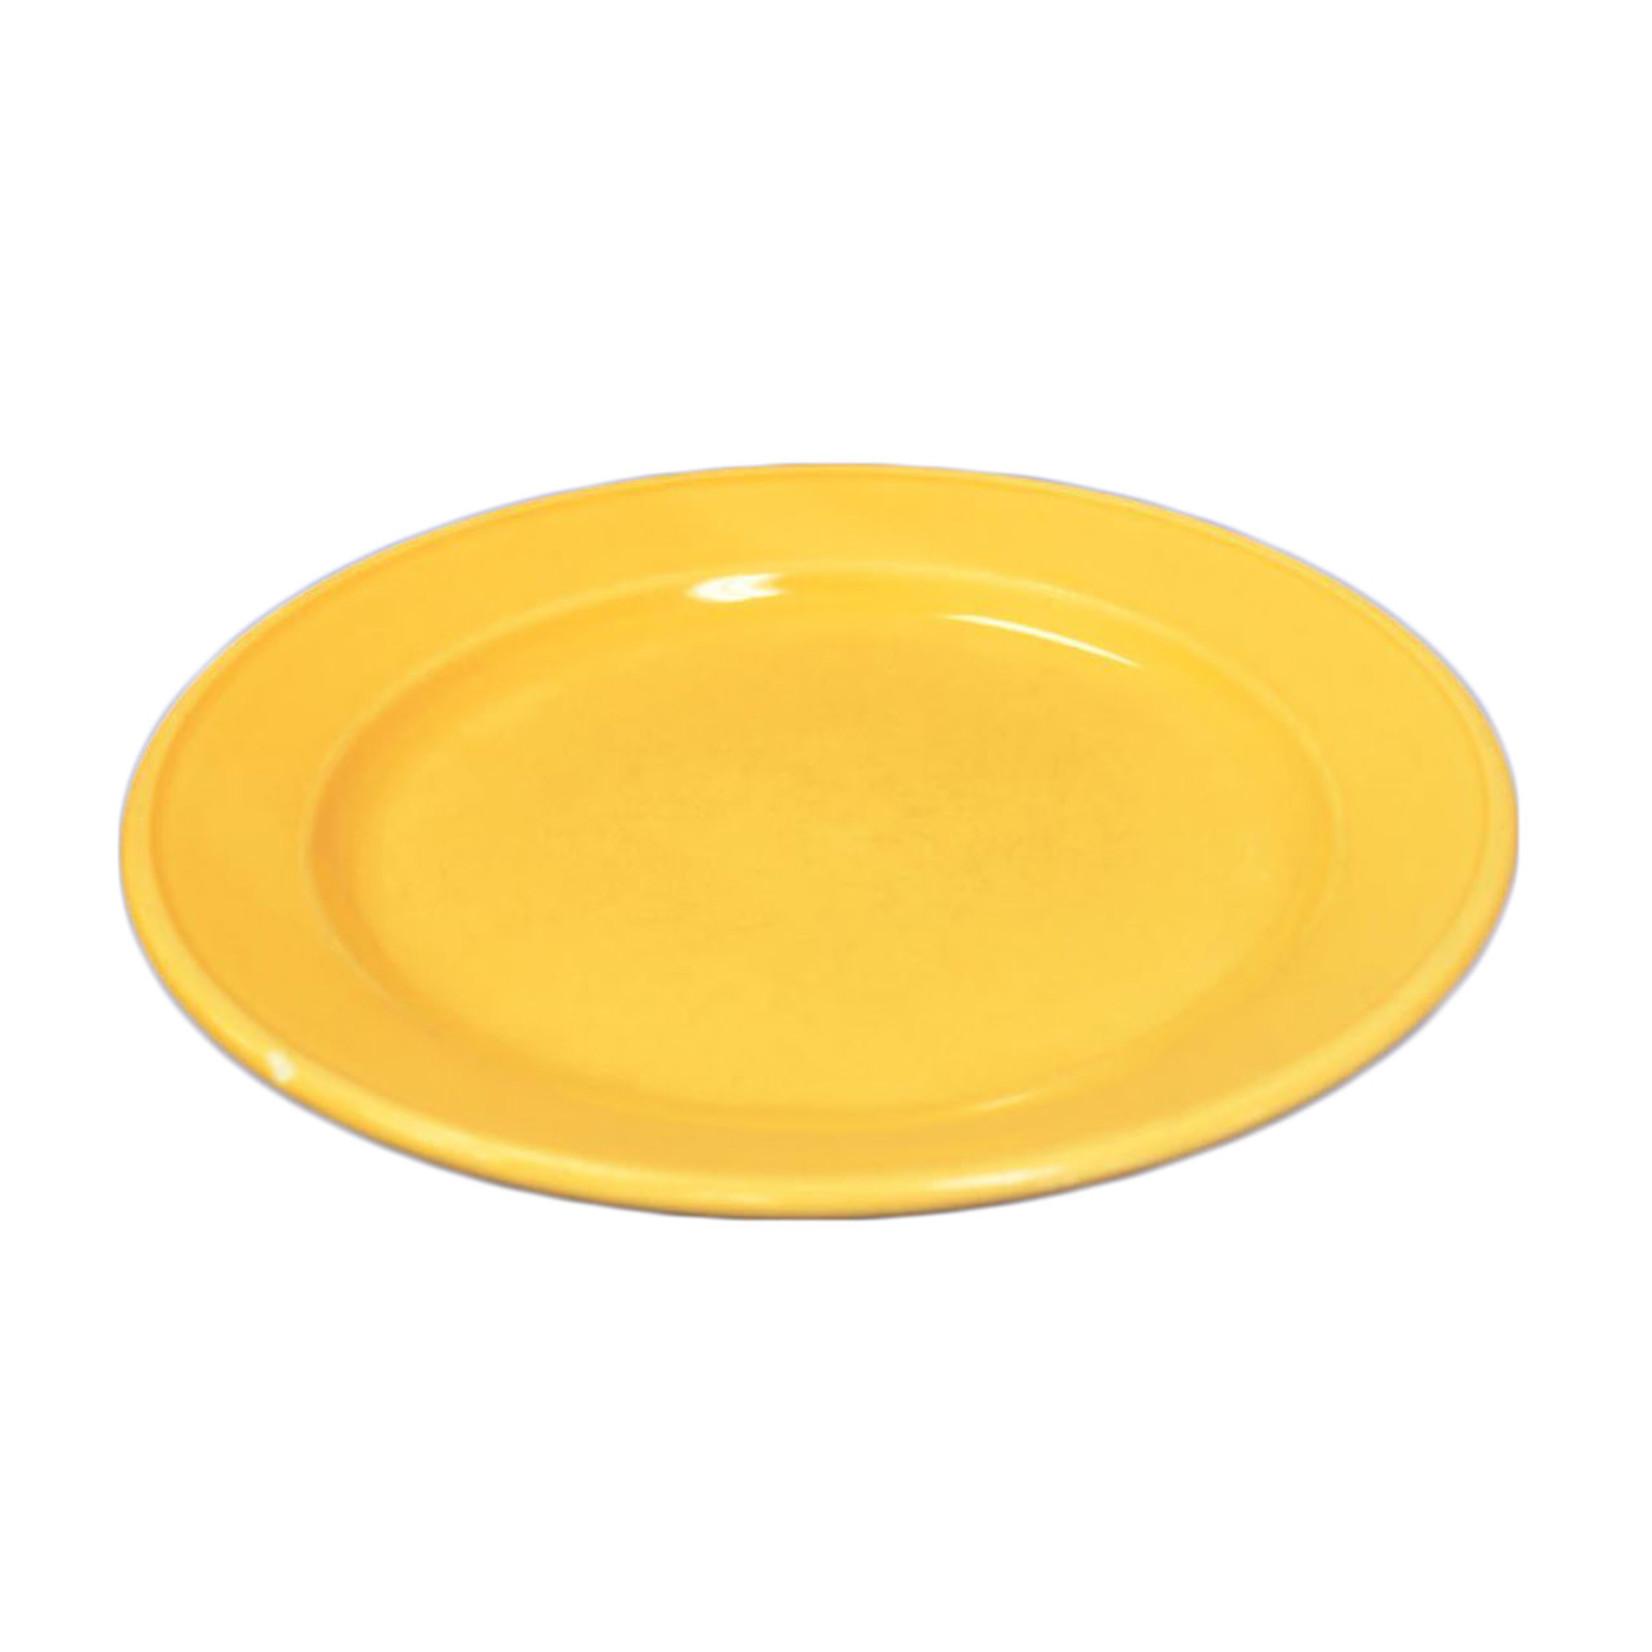 Pale Yellow Ceramic Plate